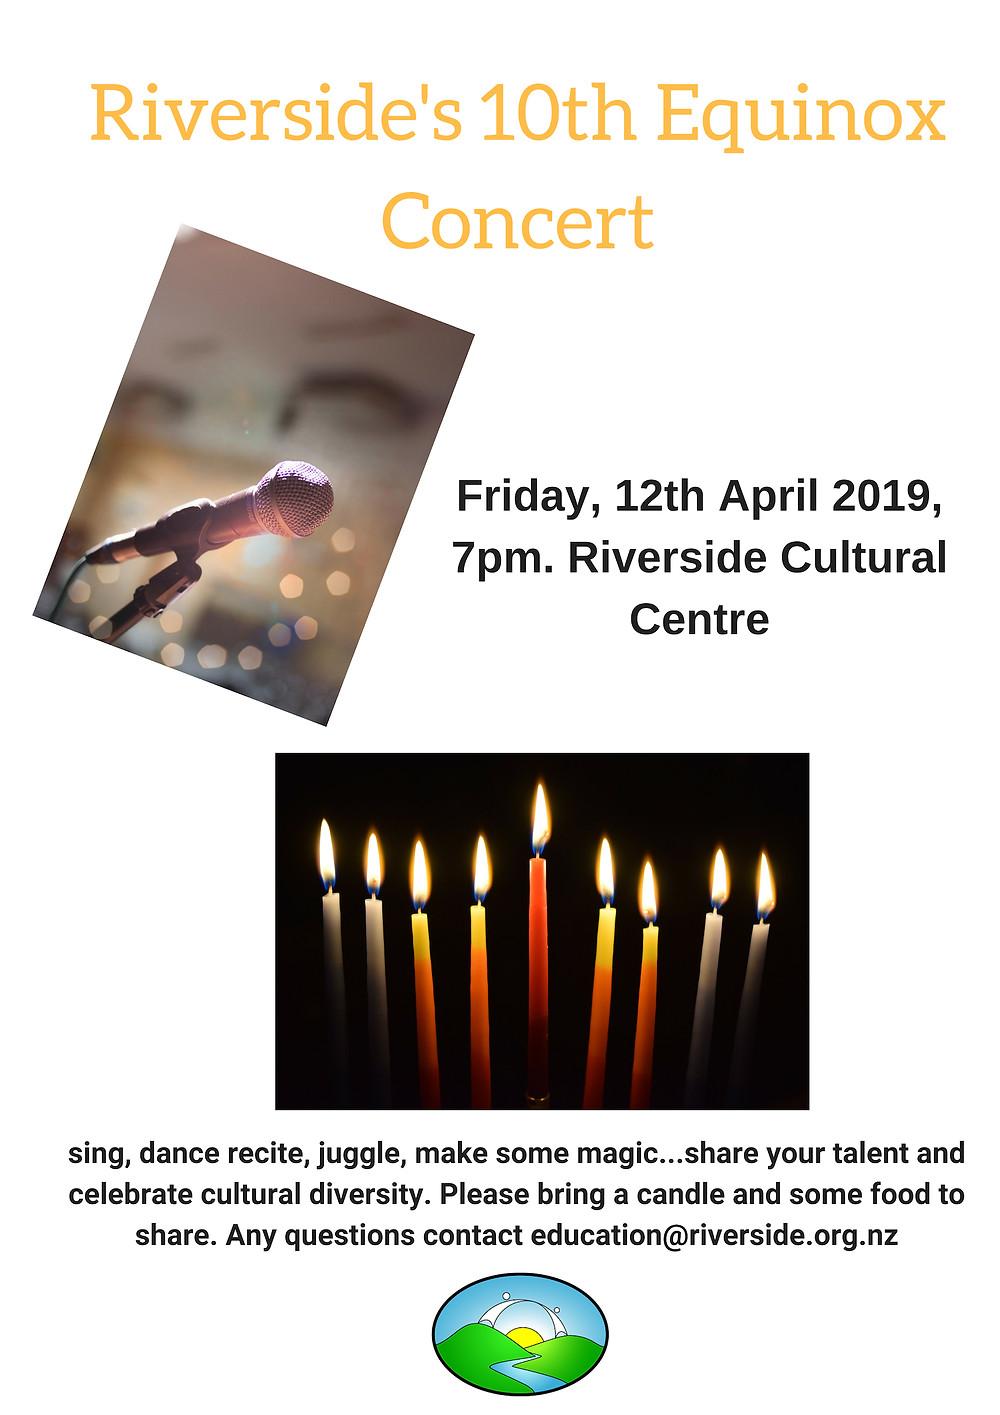 10th Equinox concert at Riverside Community